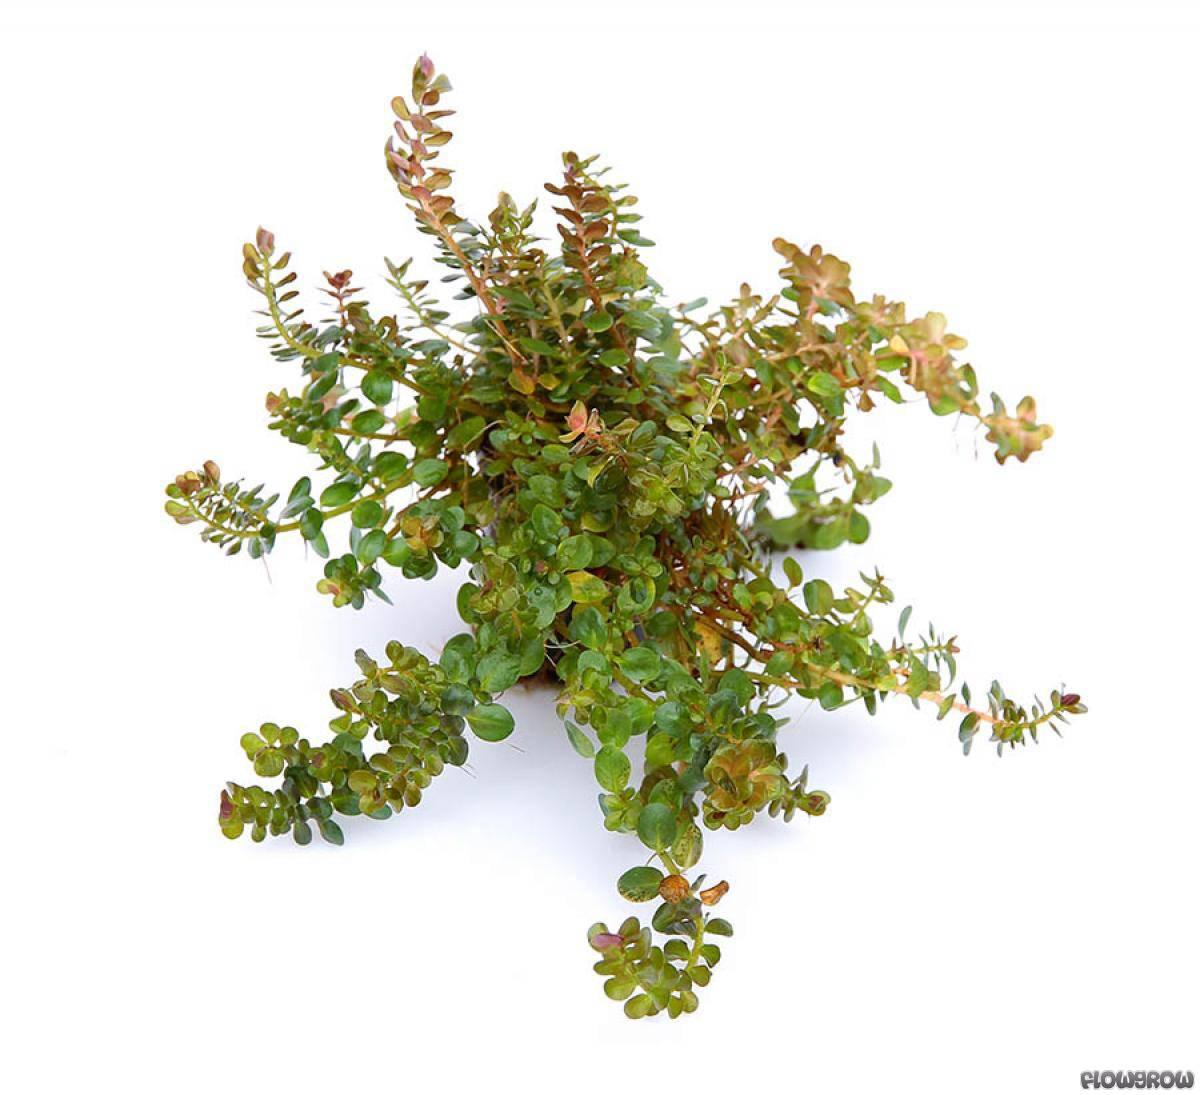 Rotala rotundifolia - Dwarf Rotala - Flowgrow Aquatic ...